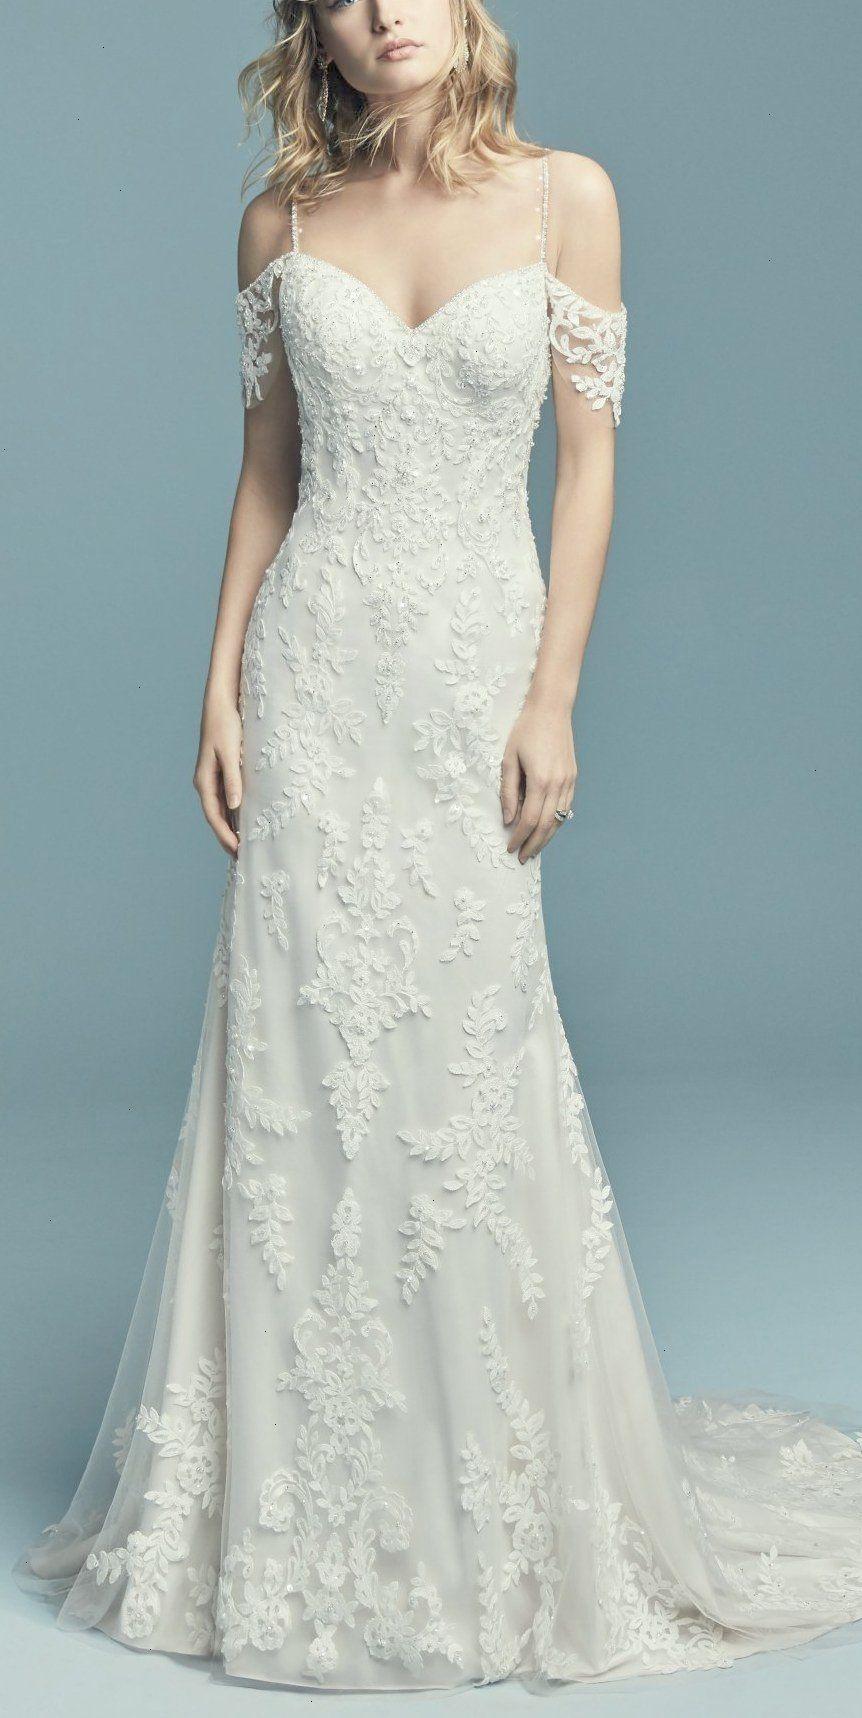 Maggie Sottero - ANGELICA Soft and elegant this sheath wedding dress ...